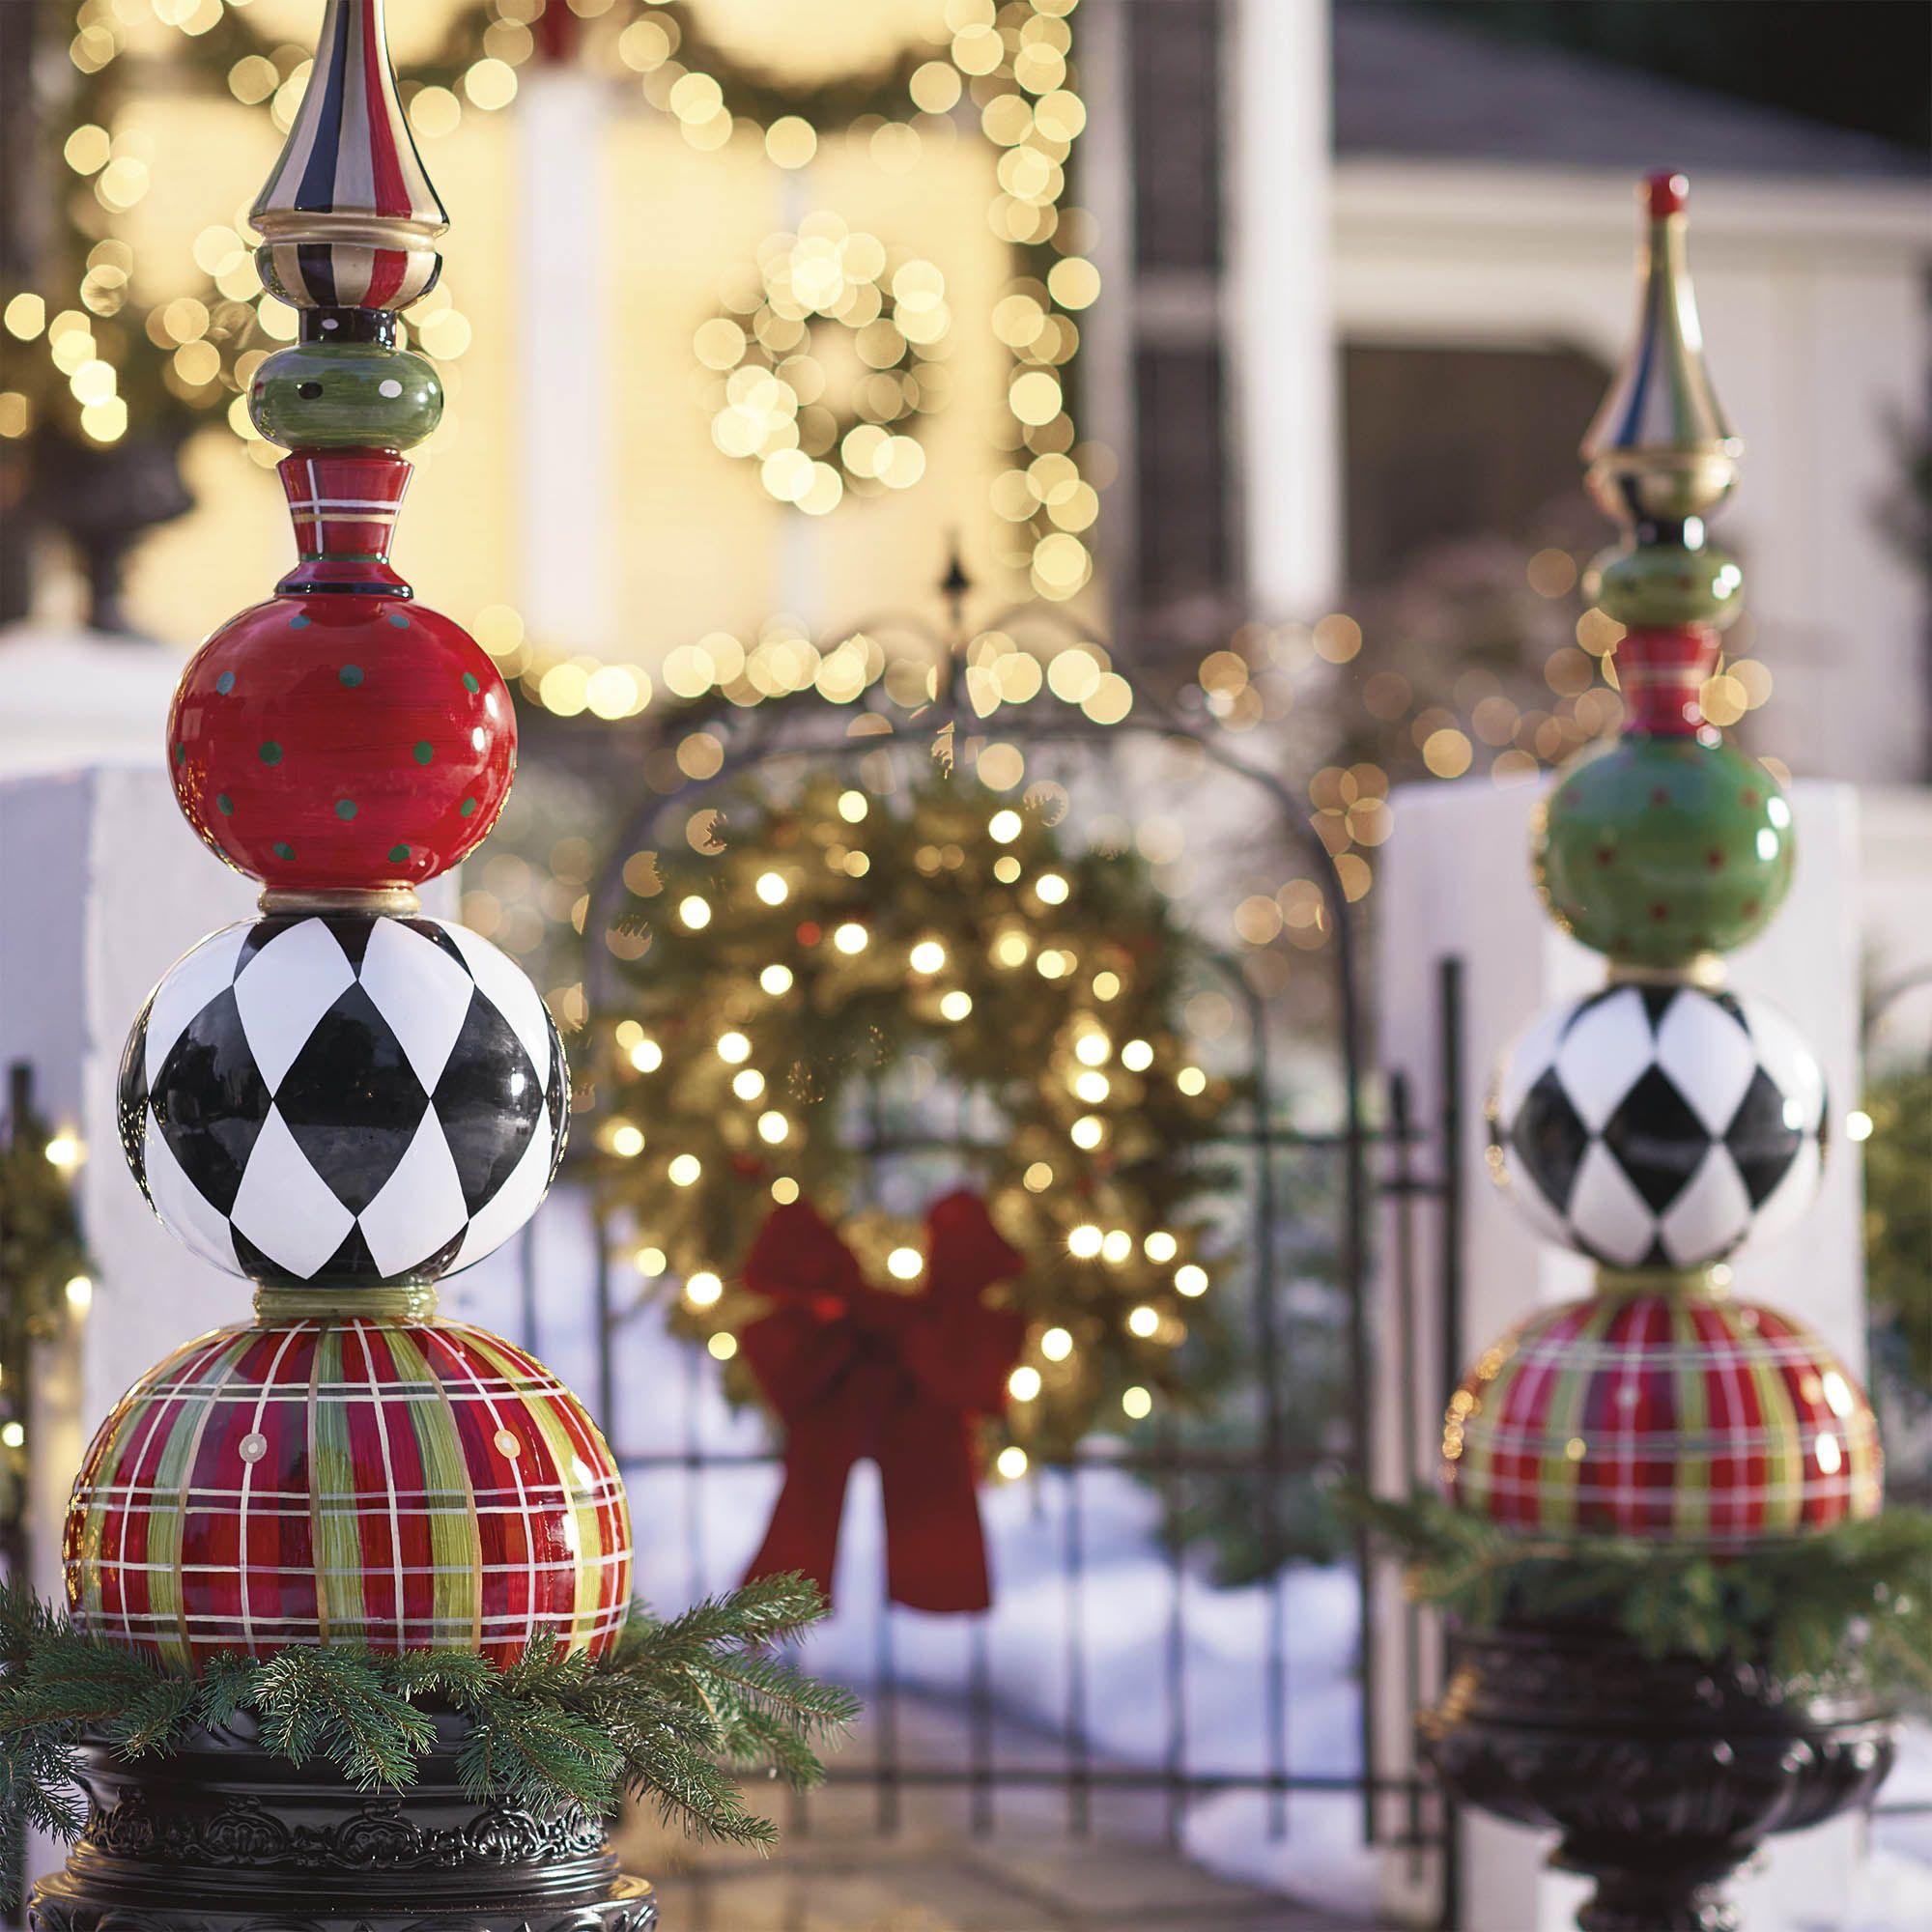 13 Outdoor Christmas Decoration Ideas - Stylish Outside Christmas ...